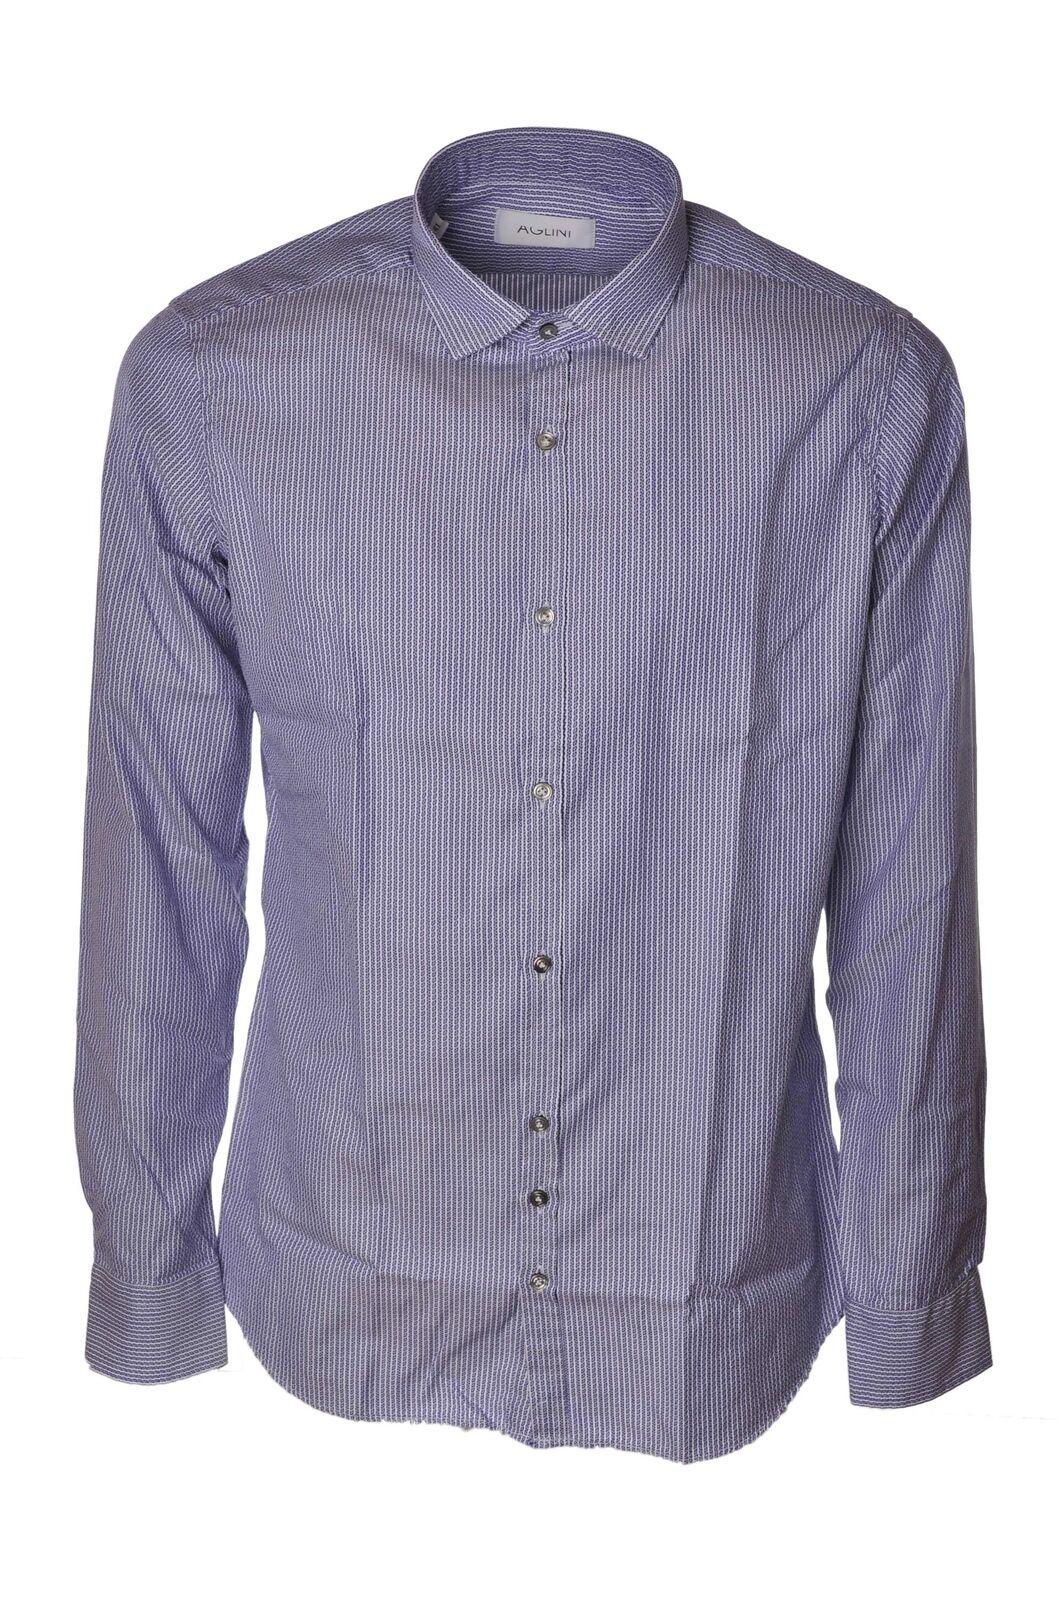 Aglini - Shirts-Shirt - Man - Blau - 4066702C183910